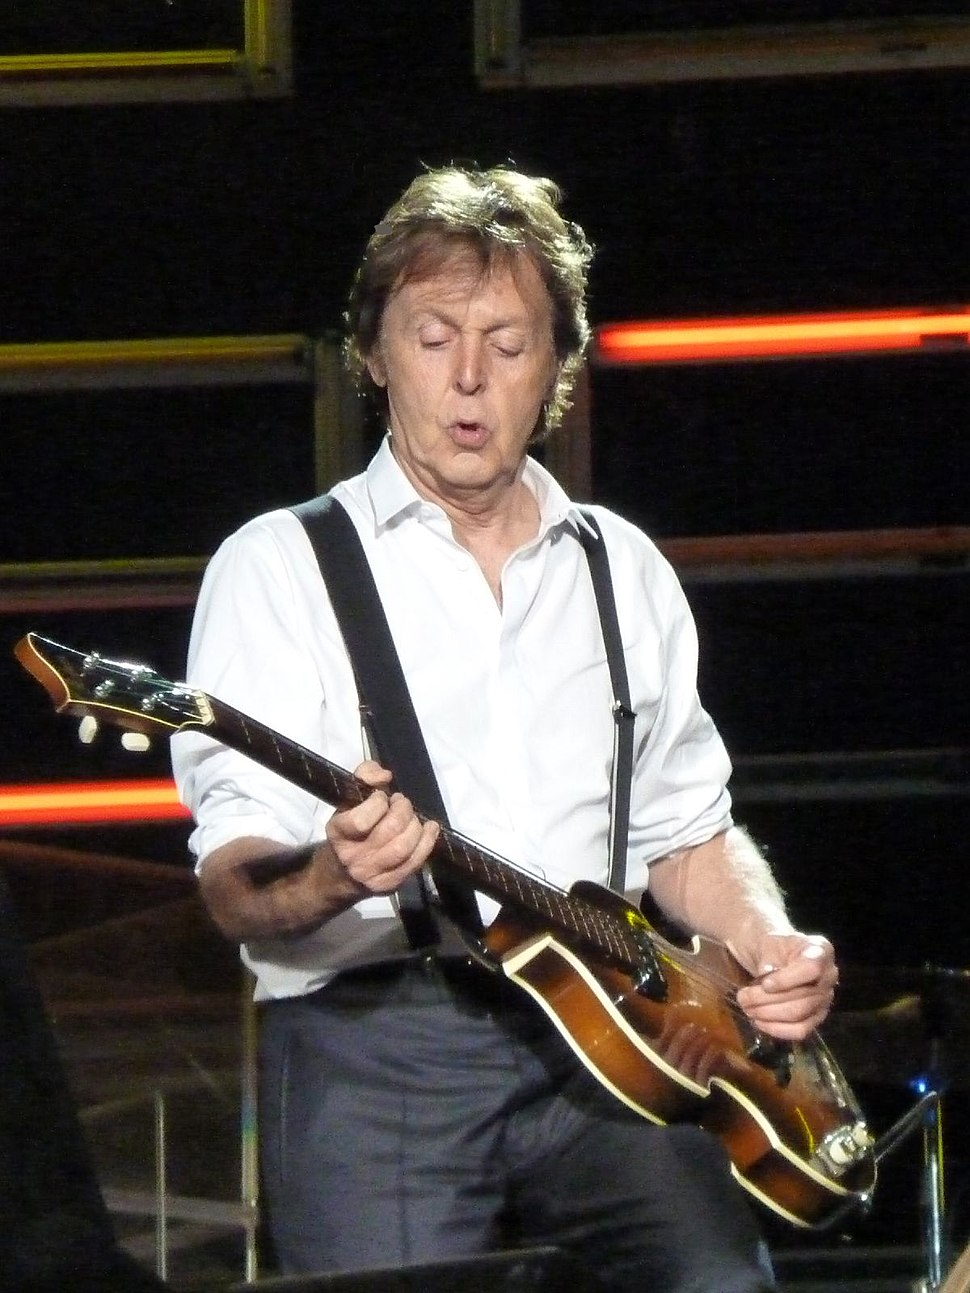 Paul McCartney live in Dublin